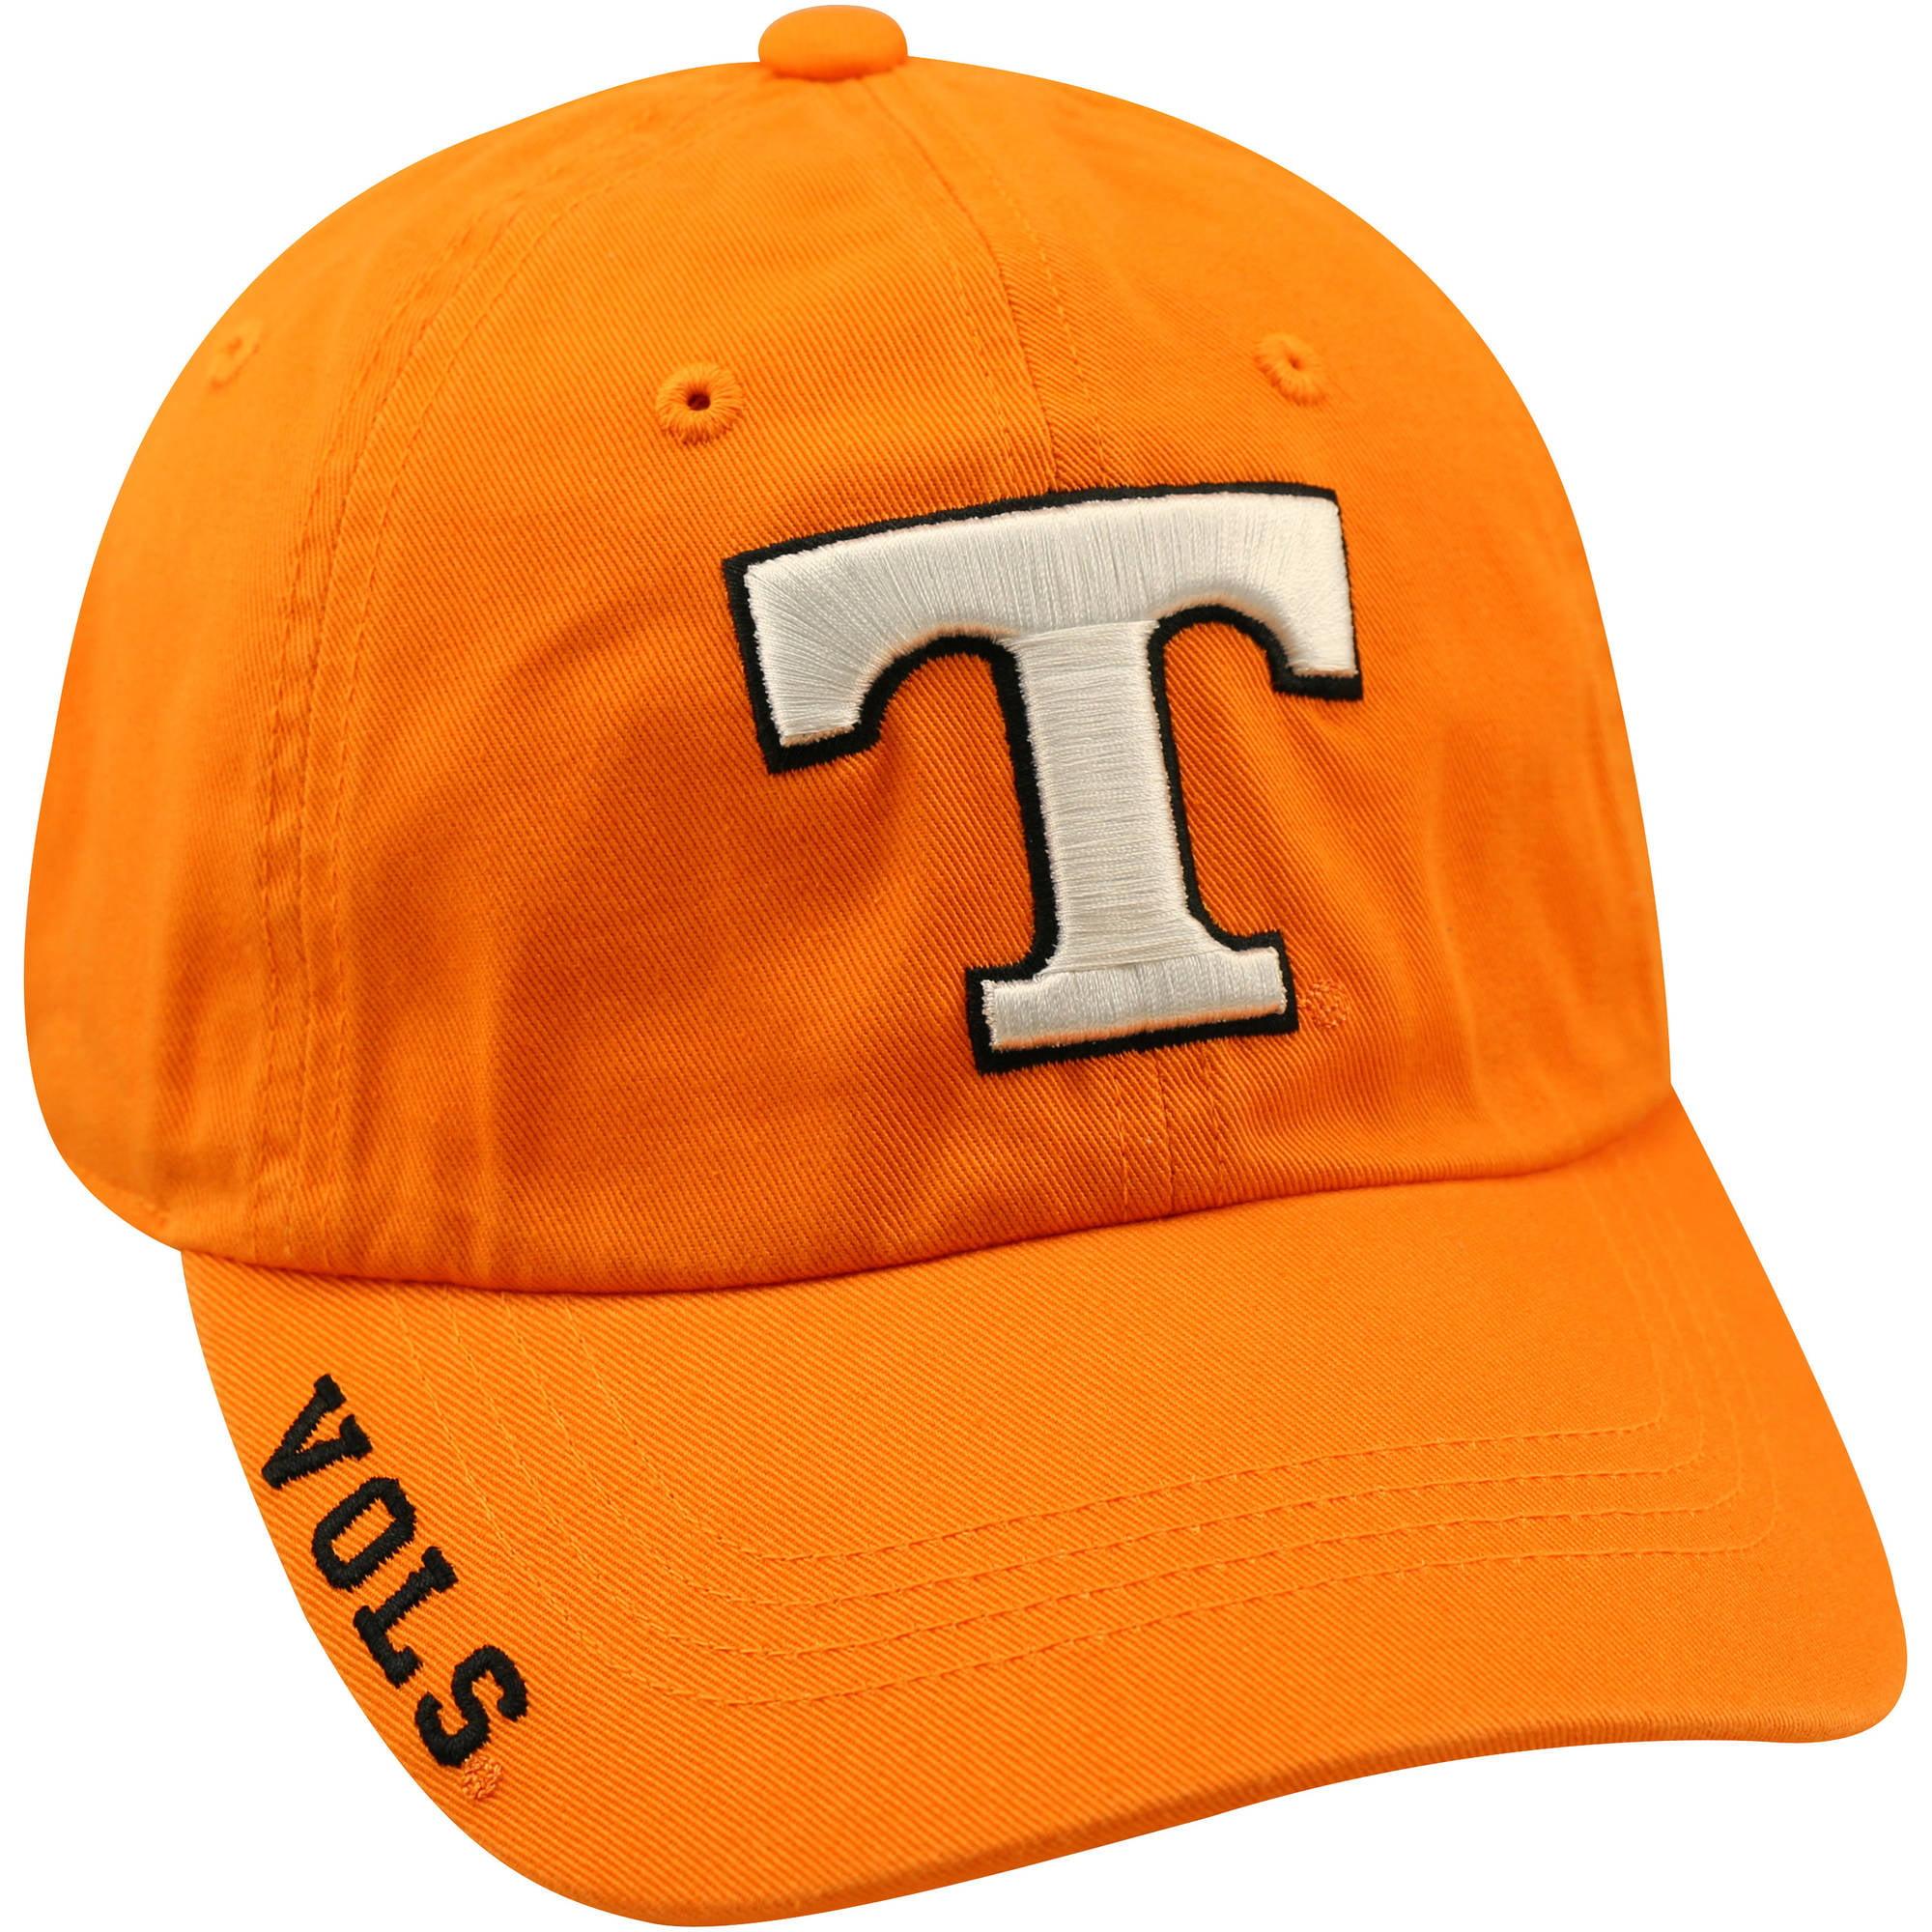 Russell NCAA Men's Tennessee Volunteers Home Cap